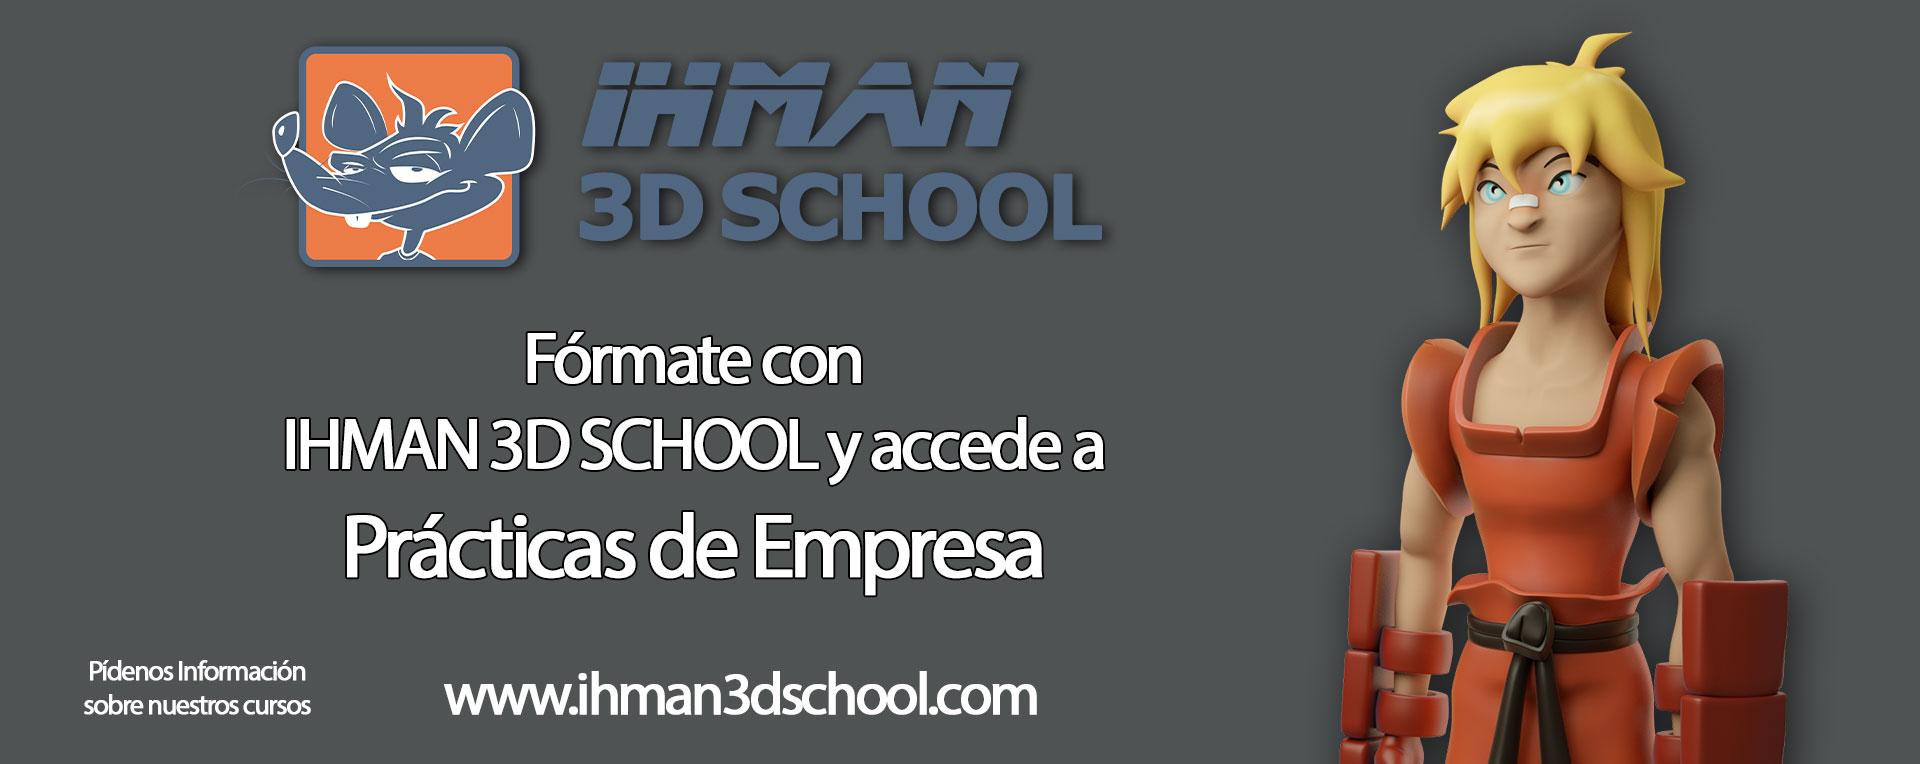 Presentación Ihman 3D School-practicas_facebook.jpg